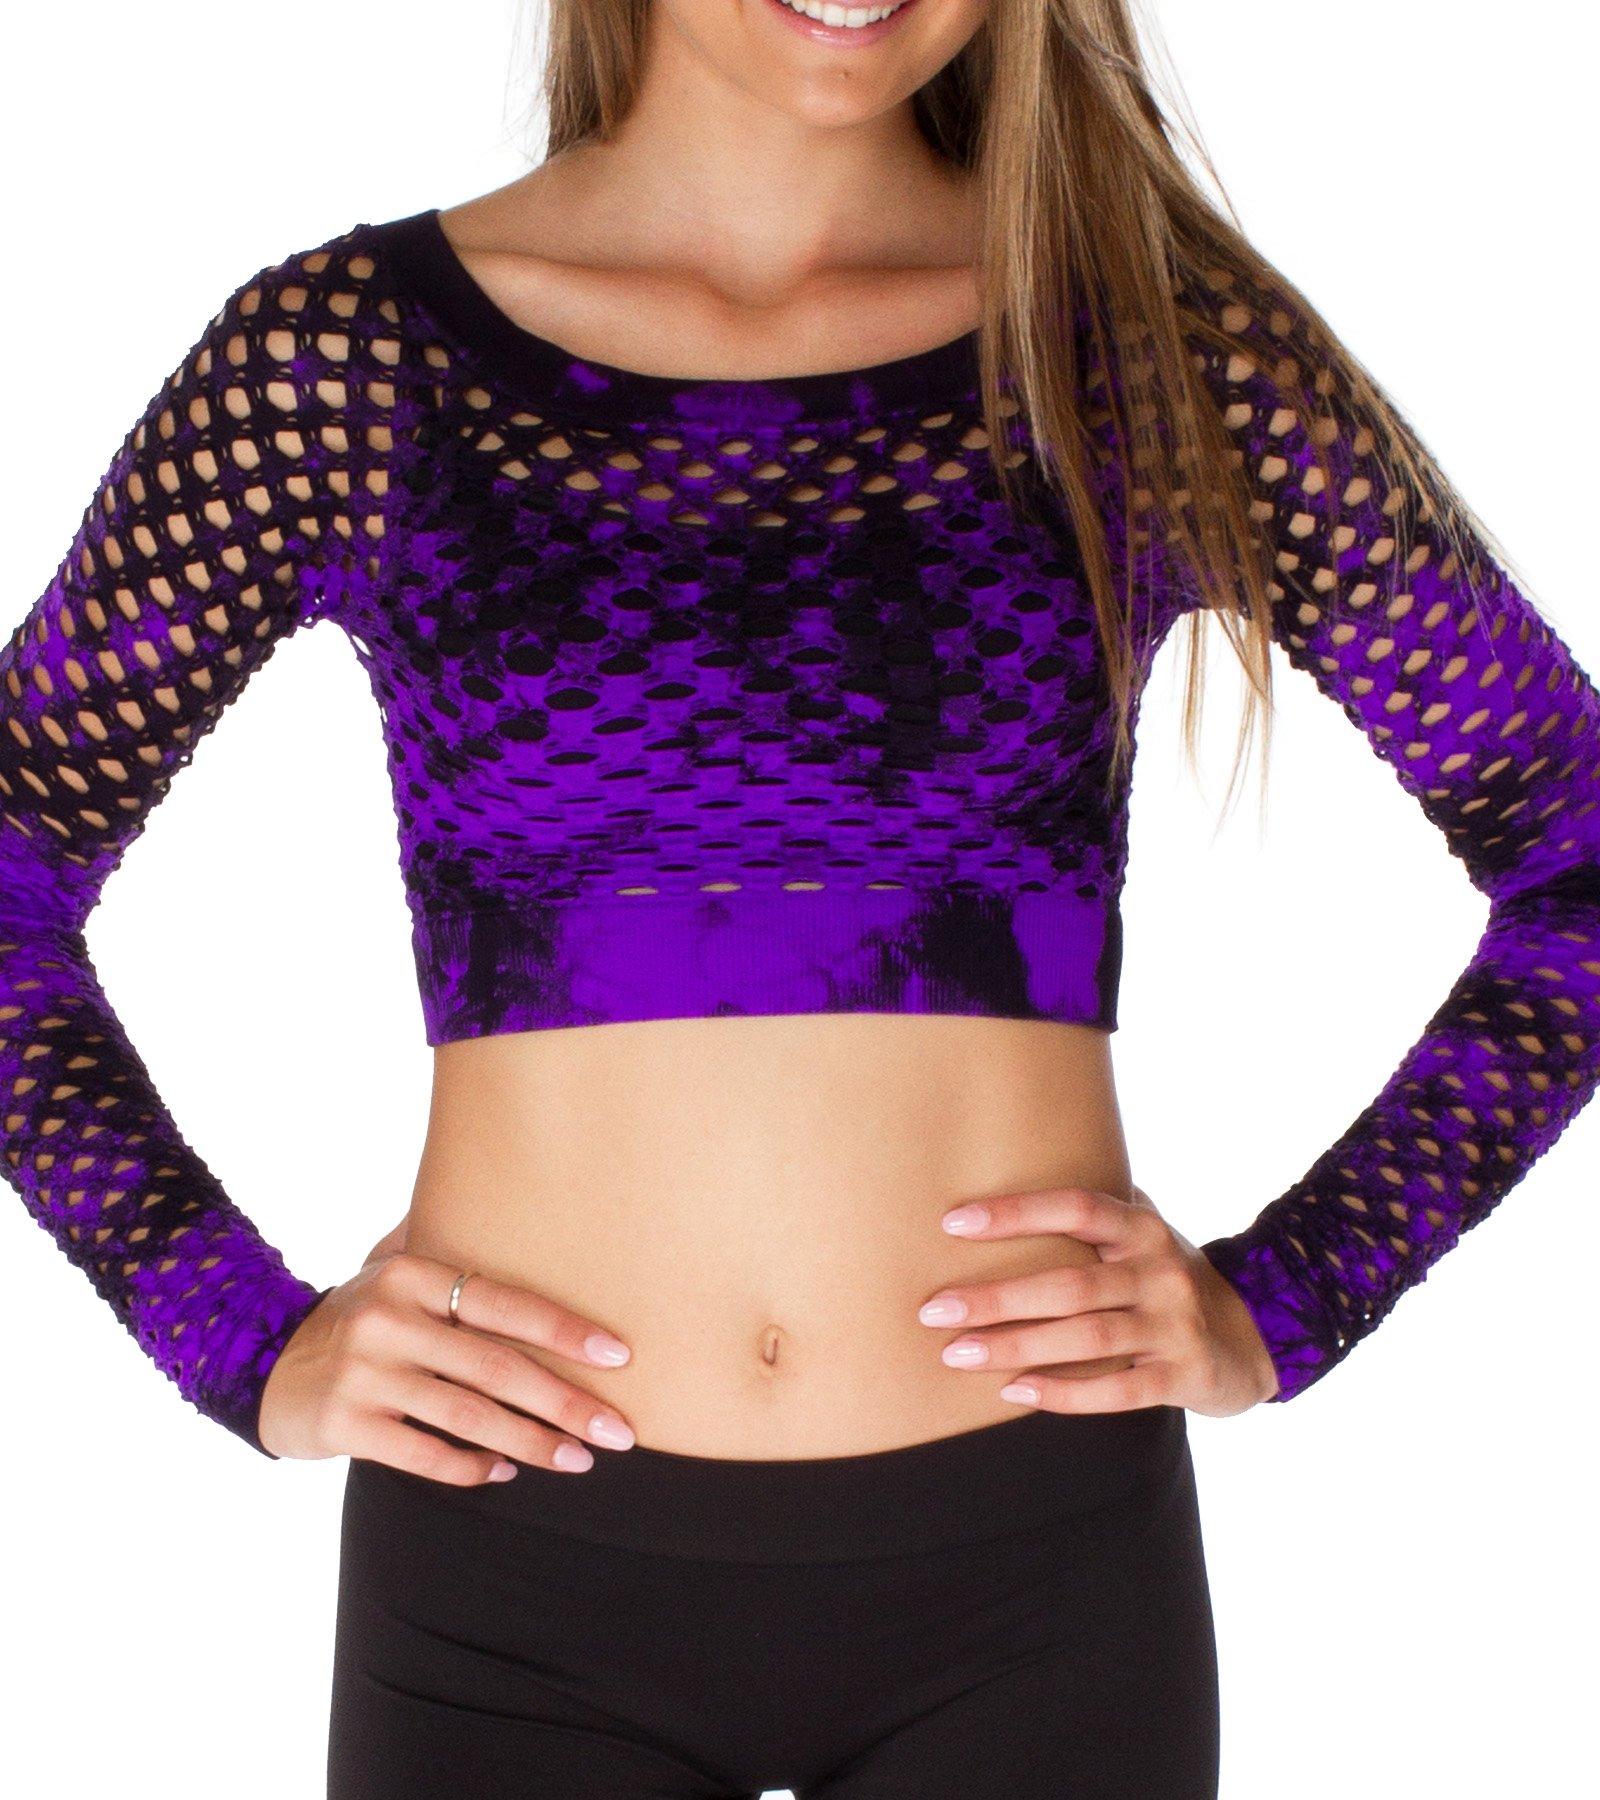 88e19592b9beef Galleon - Malibu Sugar Girls 7-14 Mesh Tie Dye Long Sleeve Crop Top One  Size Neon Purple Black